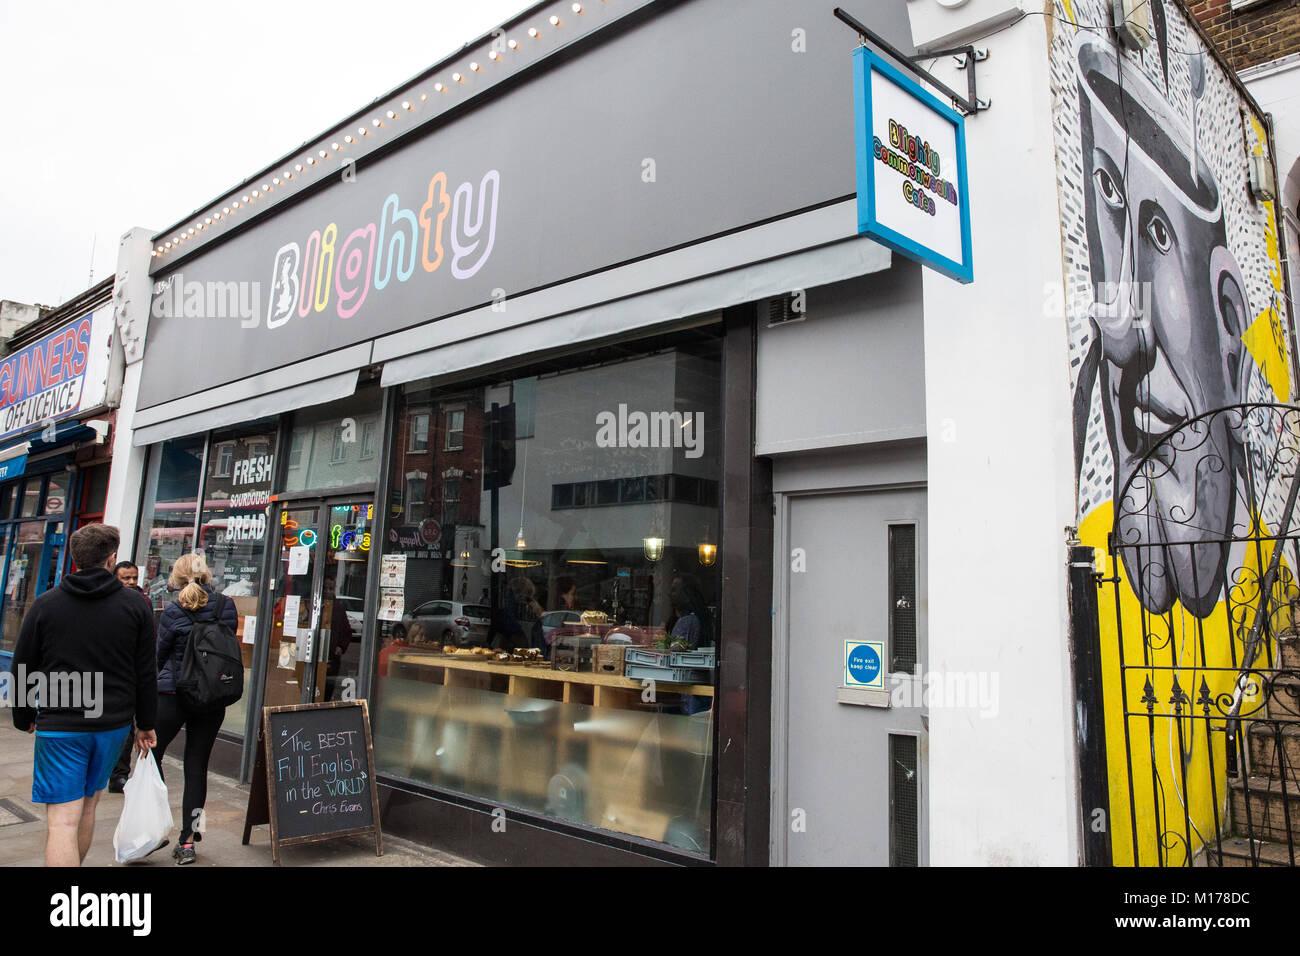 London, UK. 27th January, 2018. The Blighty UK café in Finsbury Park. The café, themed around Sir Winston - Stock Image